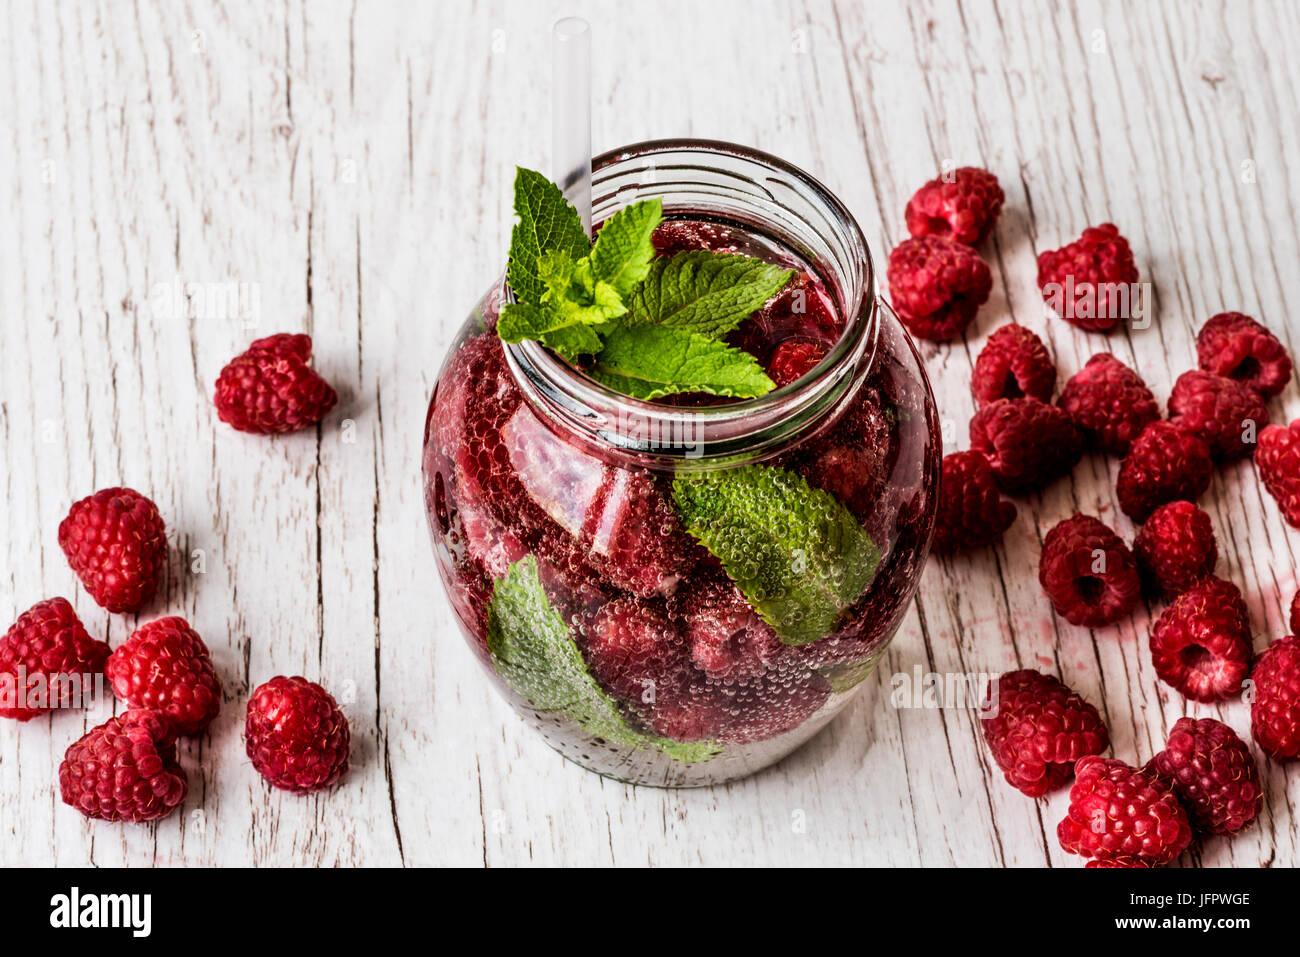 Detox agua con rasberry sobre fondo de madera blanca. Bebidas Saludables Foto de stock